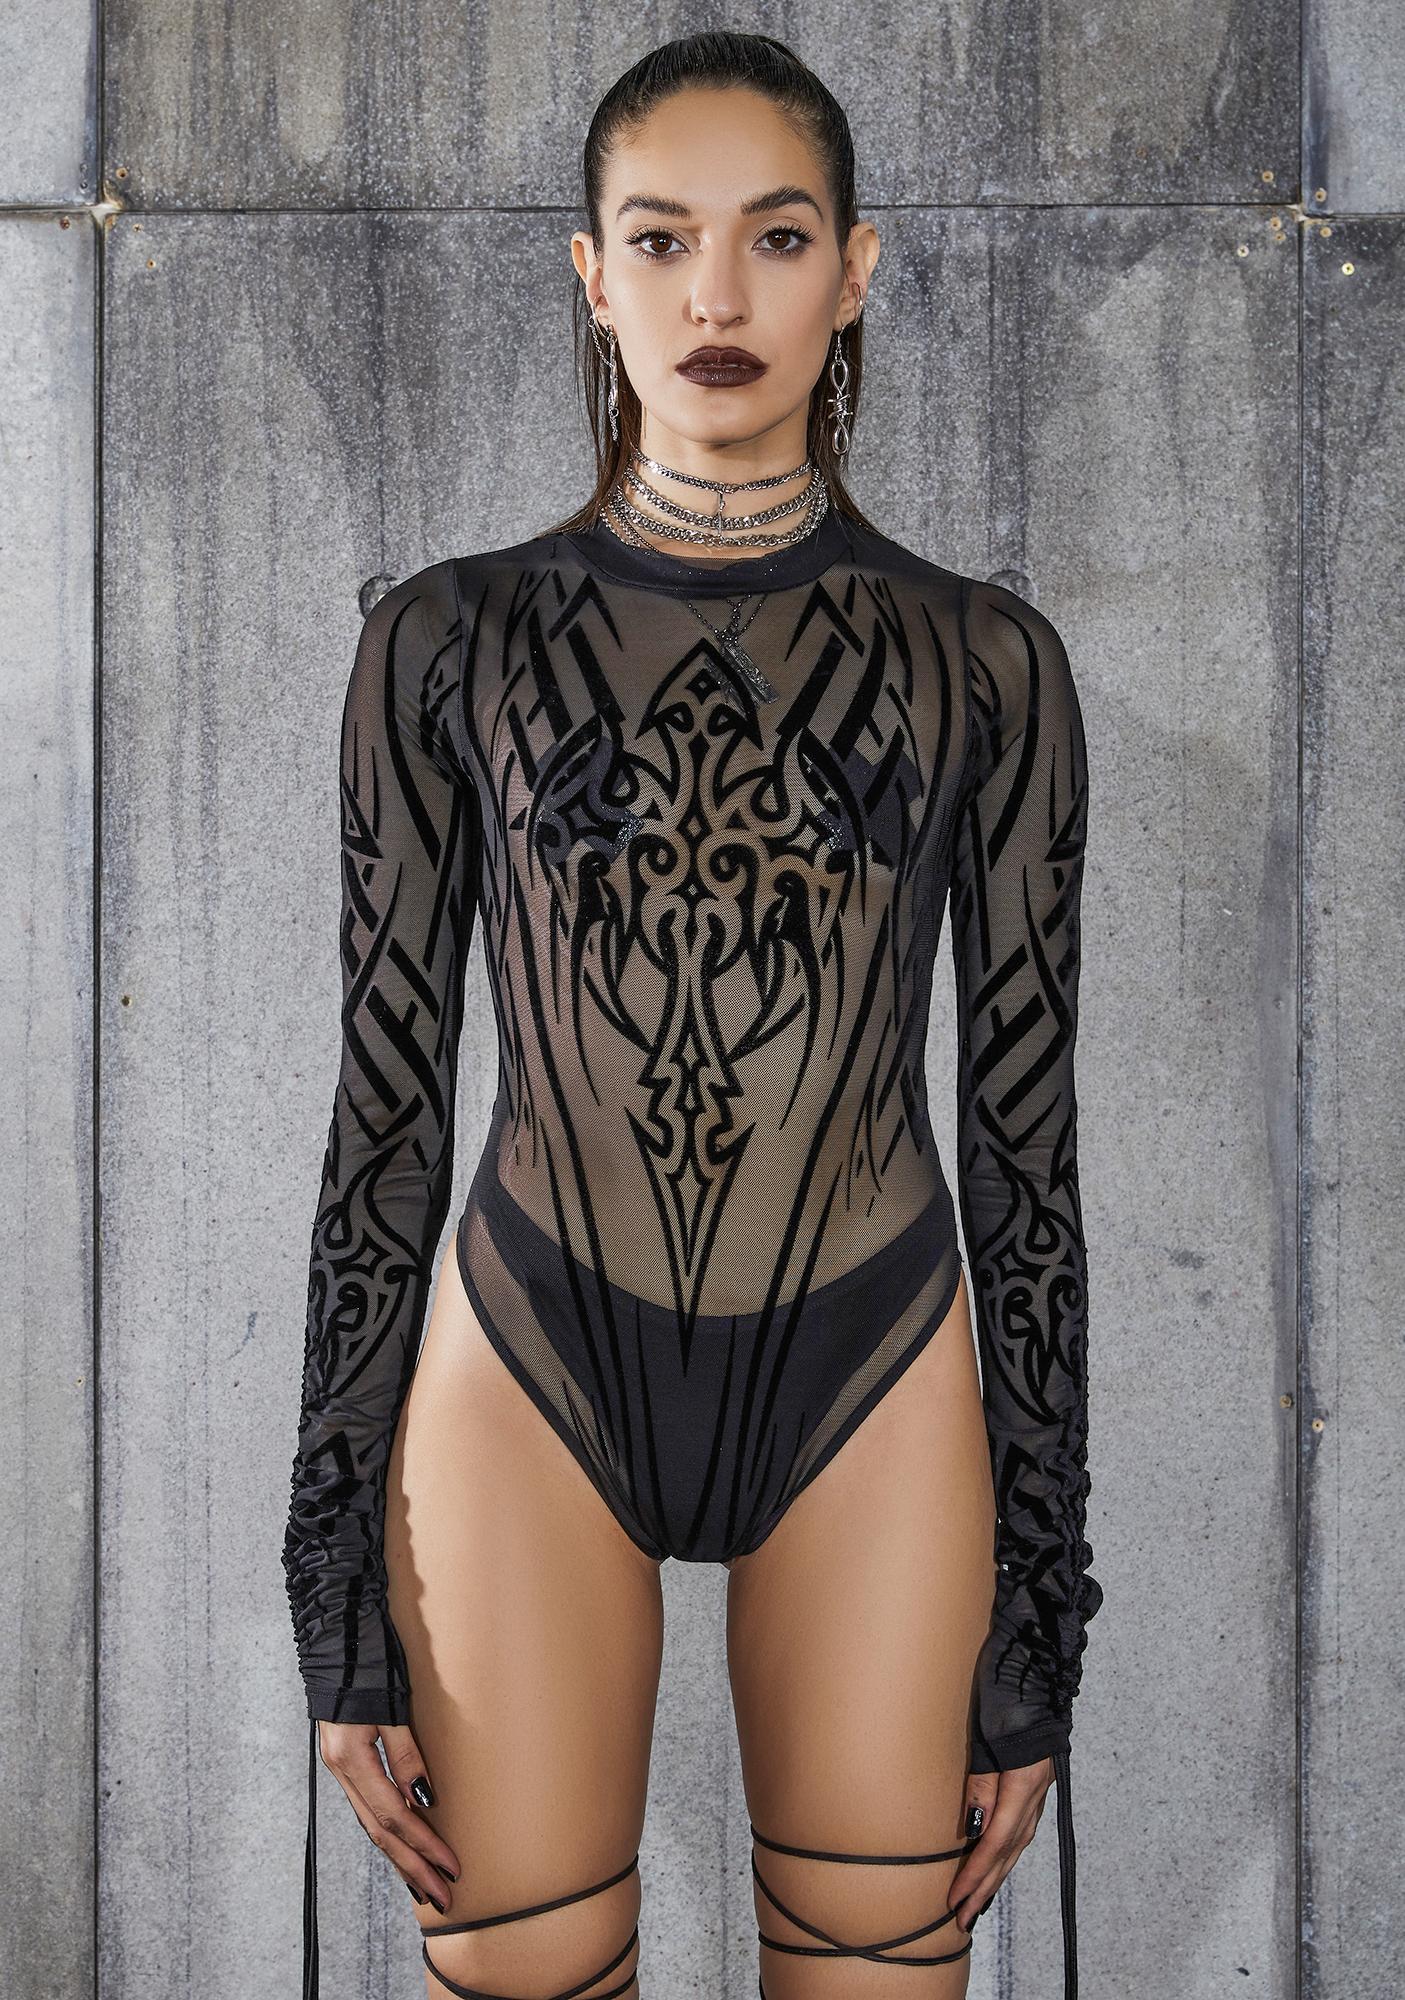 DARKER WAVS Snare Tattoo Print Mesh Bodysuit